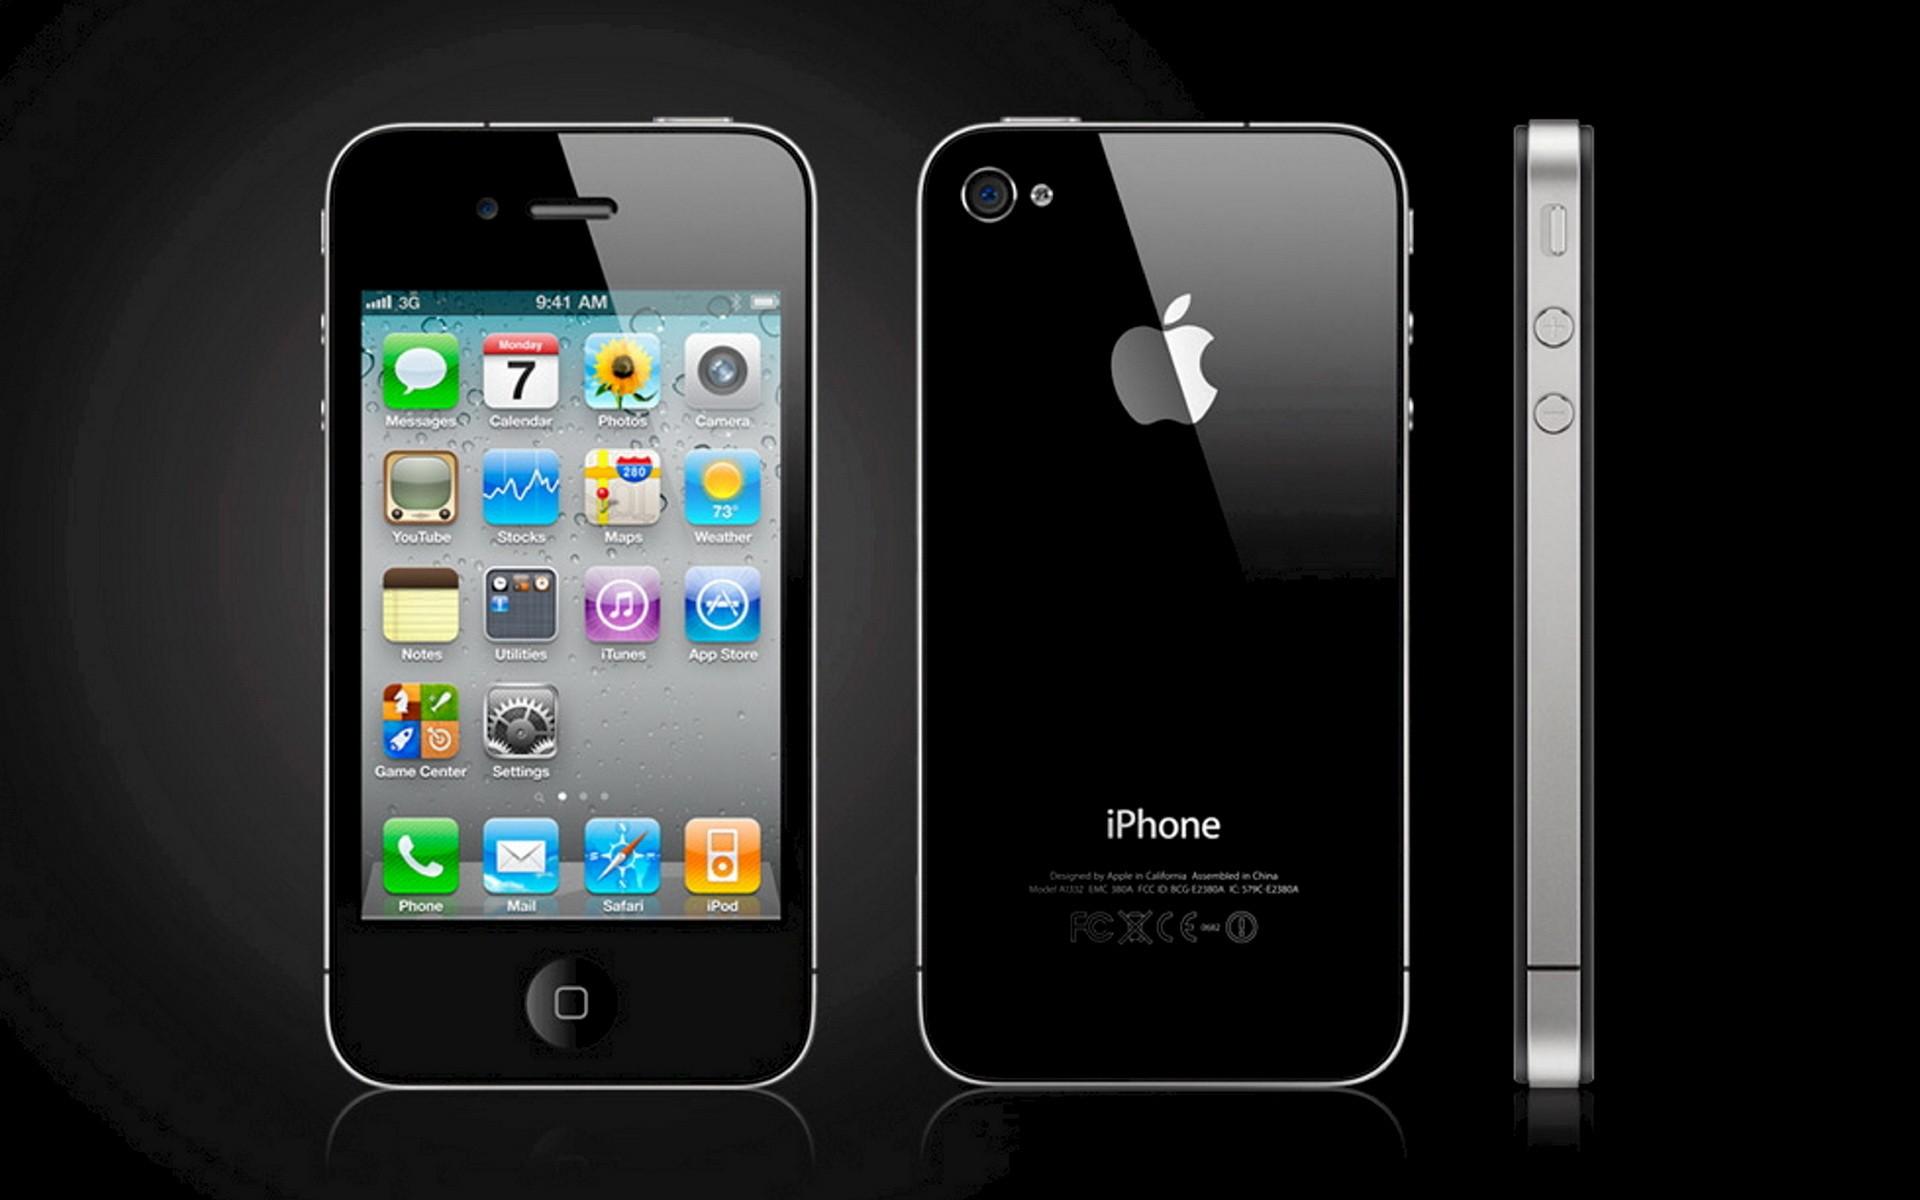 Айфон 4 год выпуска